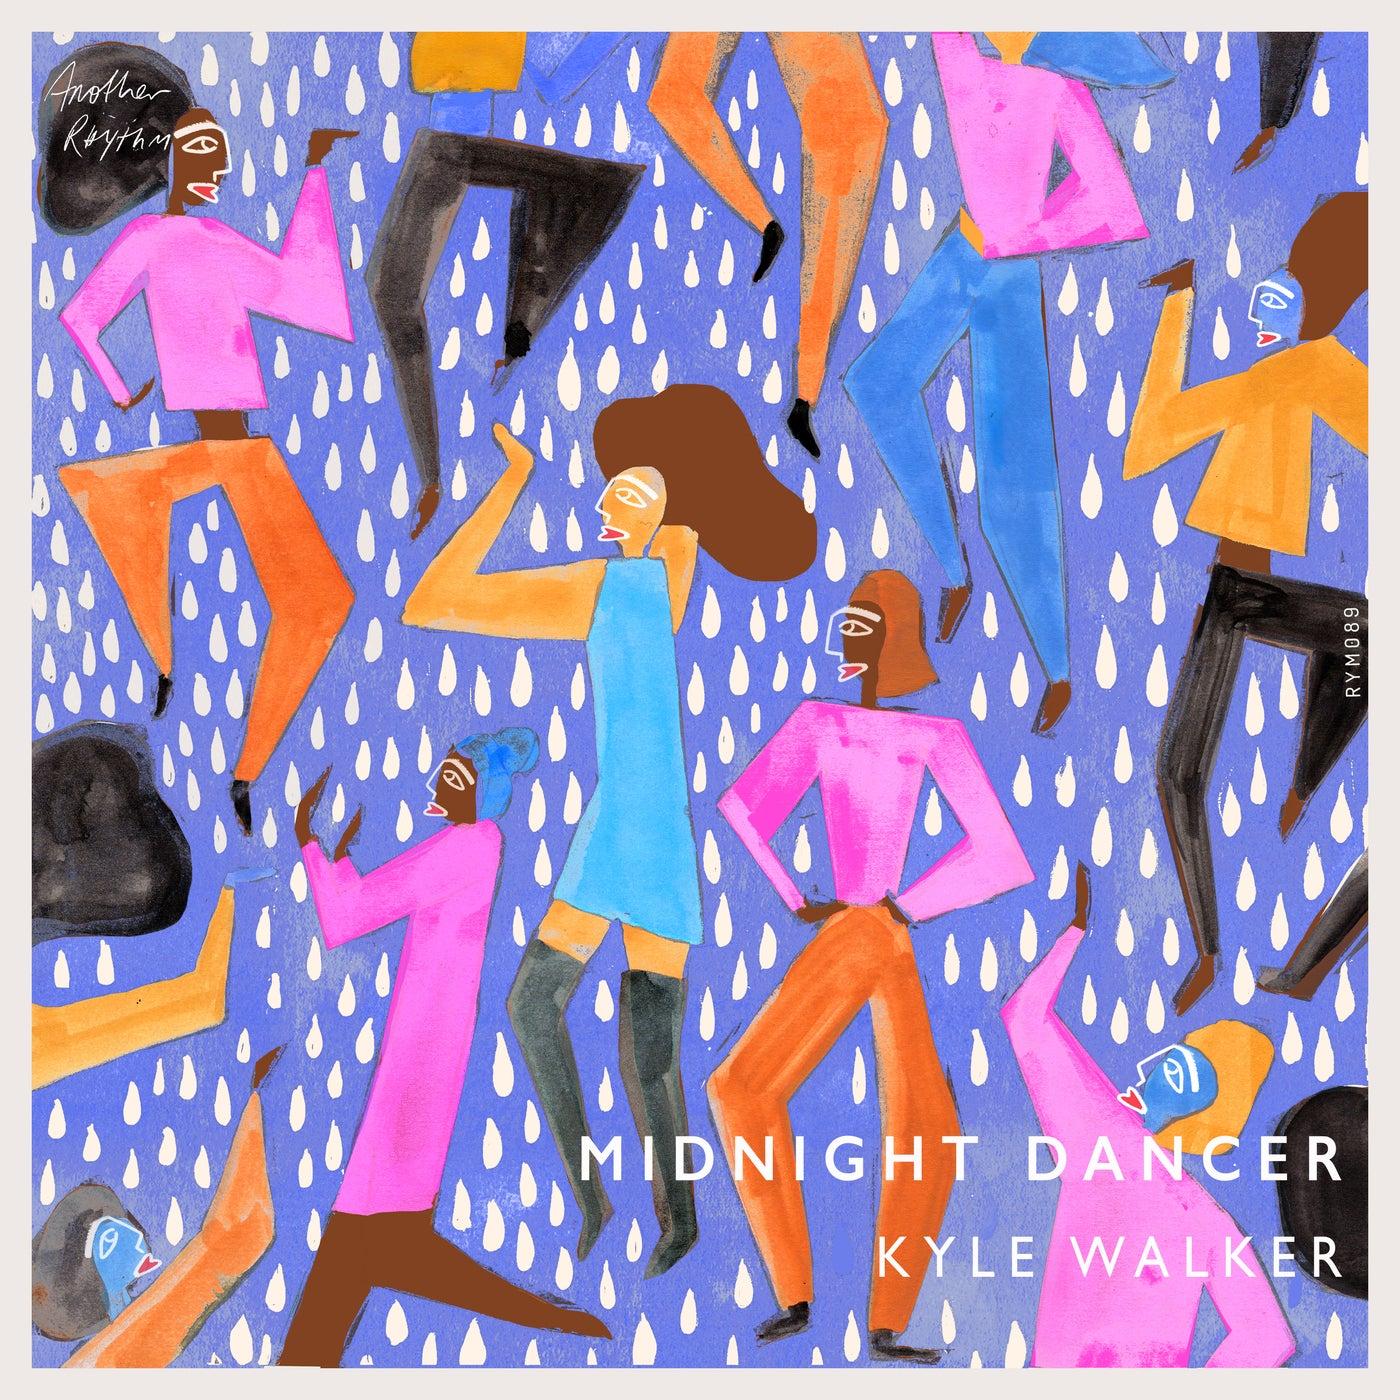 Midnight Dancer (Extended Mix)